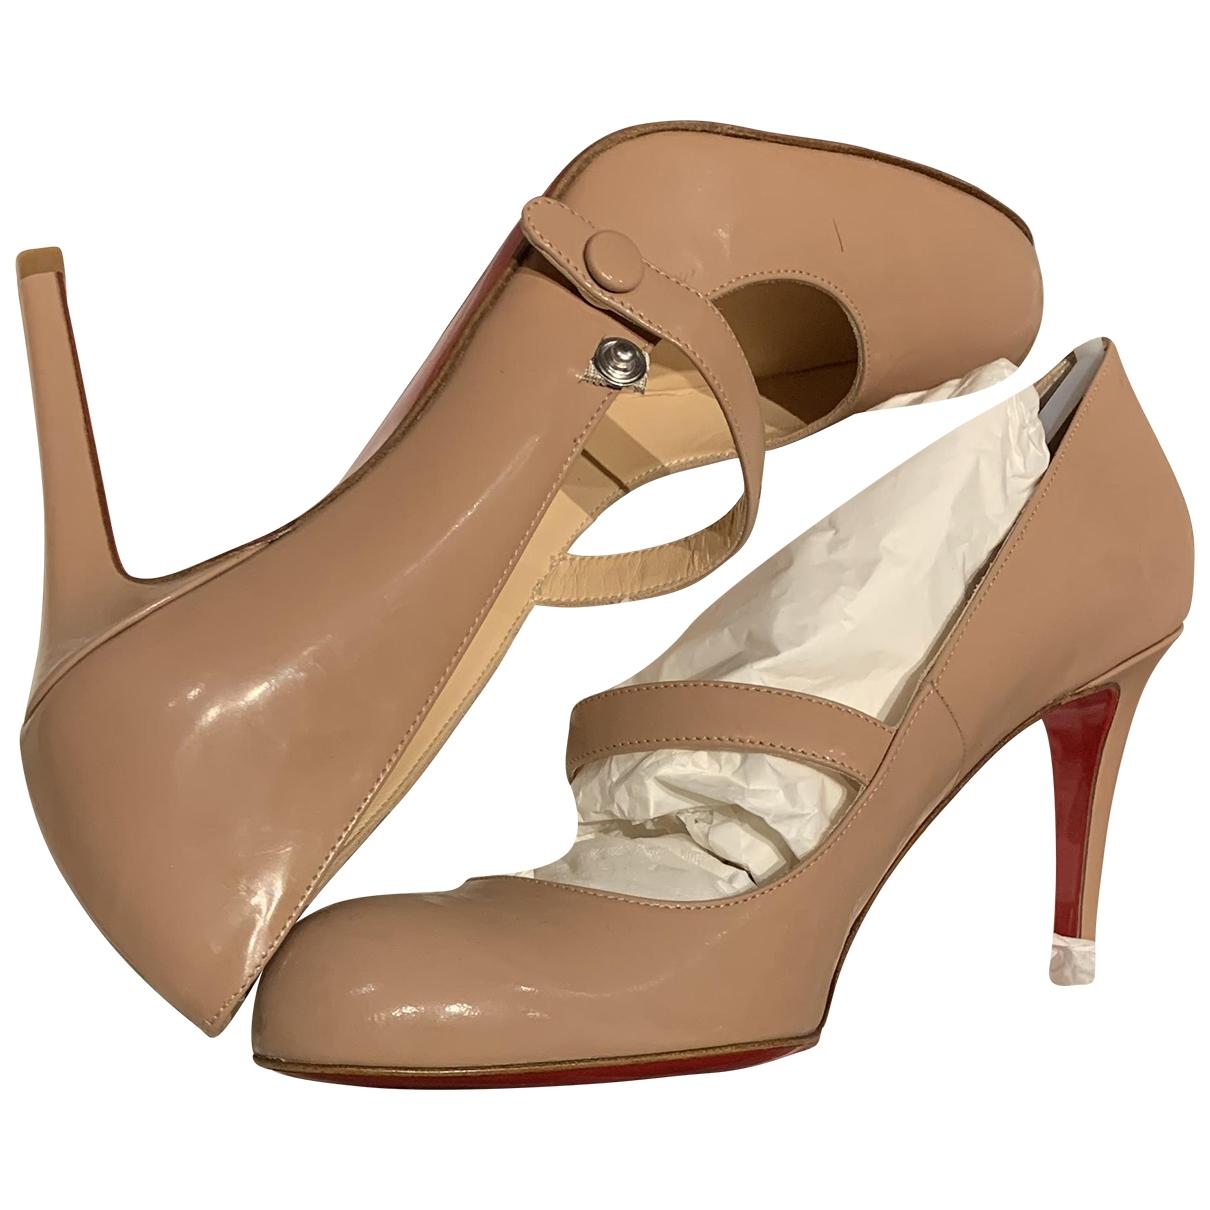 Christian Louboutin \N Beige Patent leather Heels for Women 39 EU